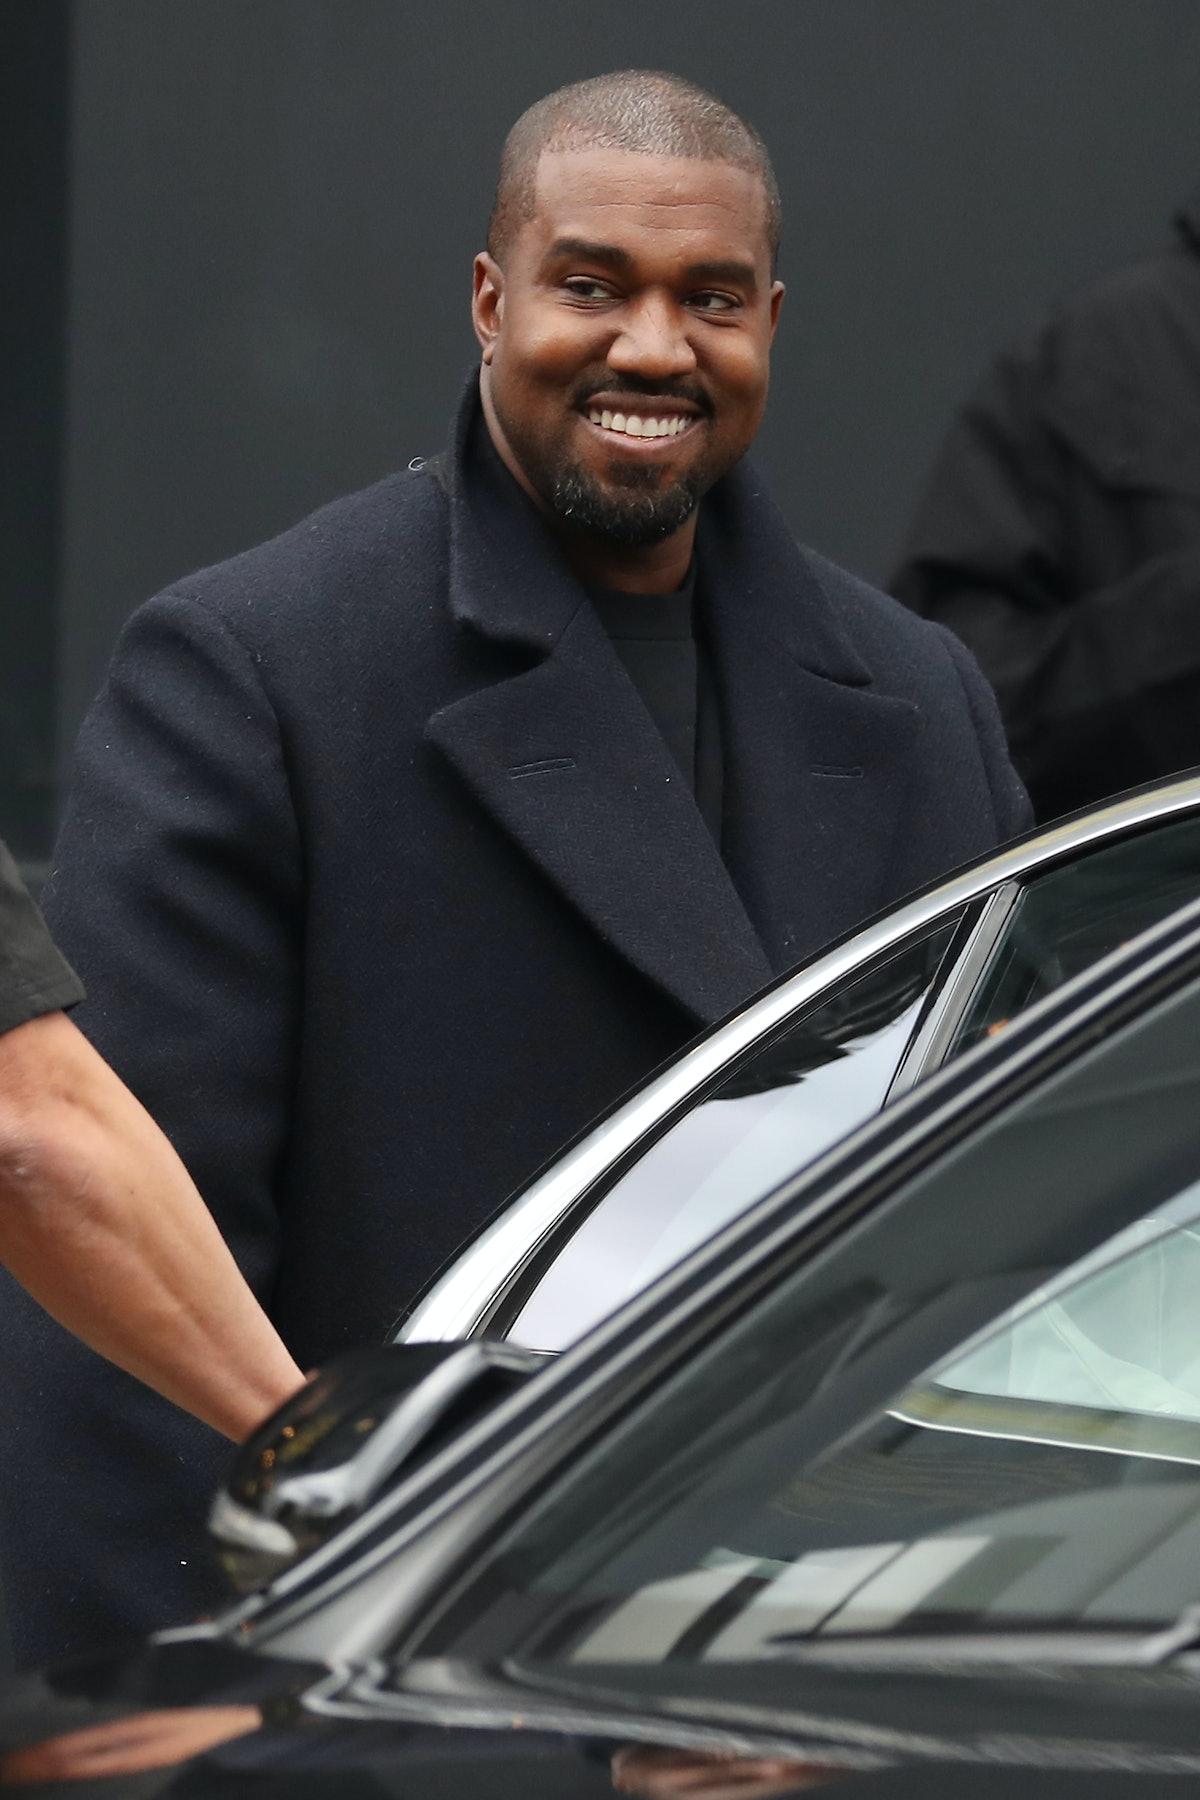 Kanye West flashes a smile.